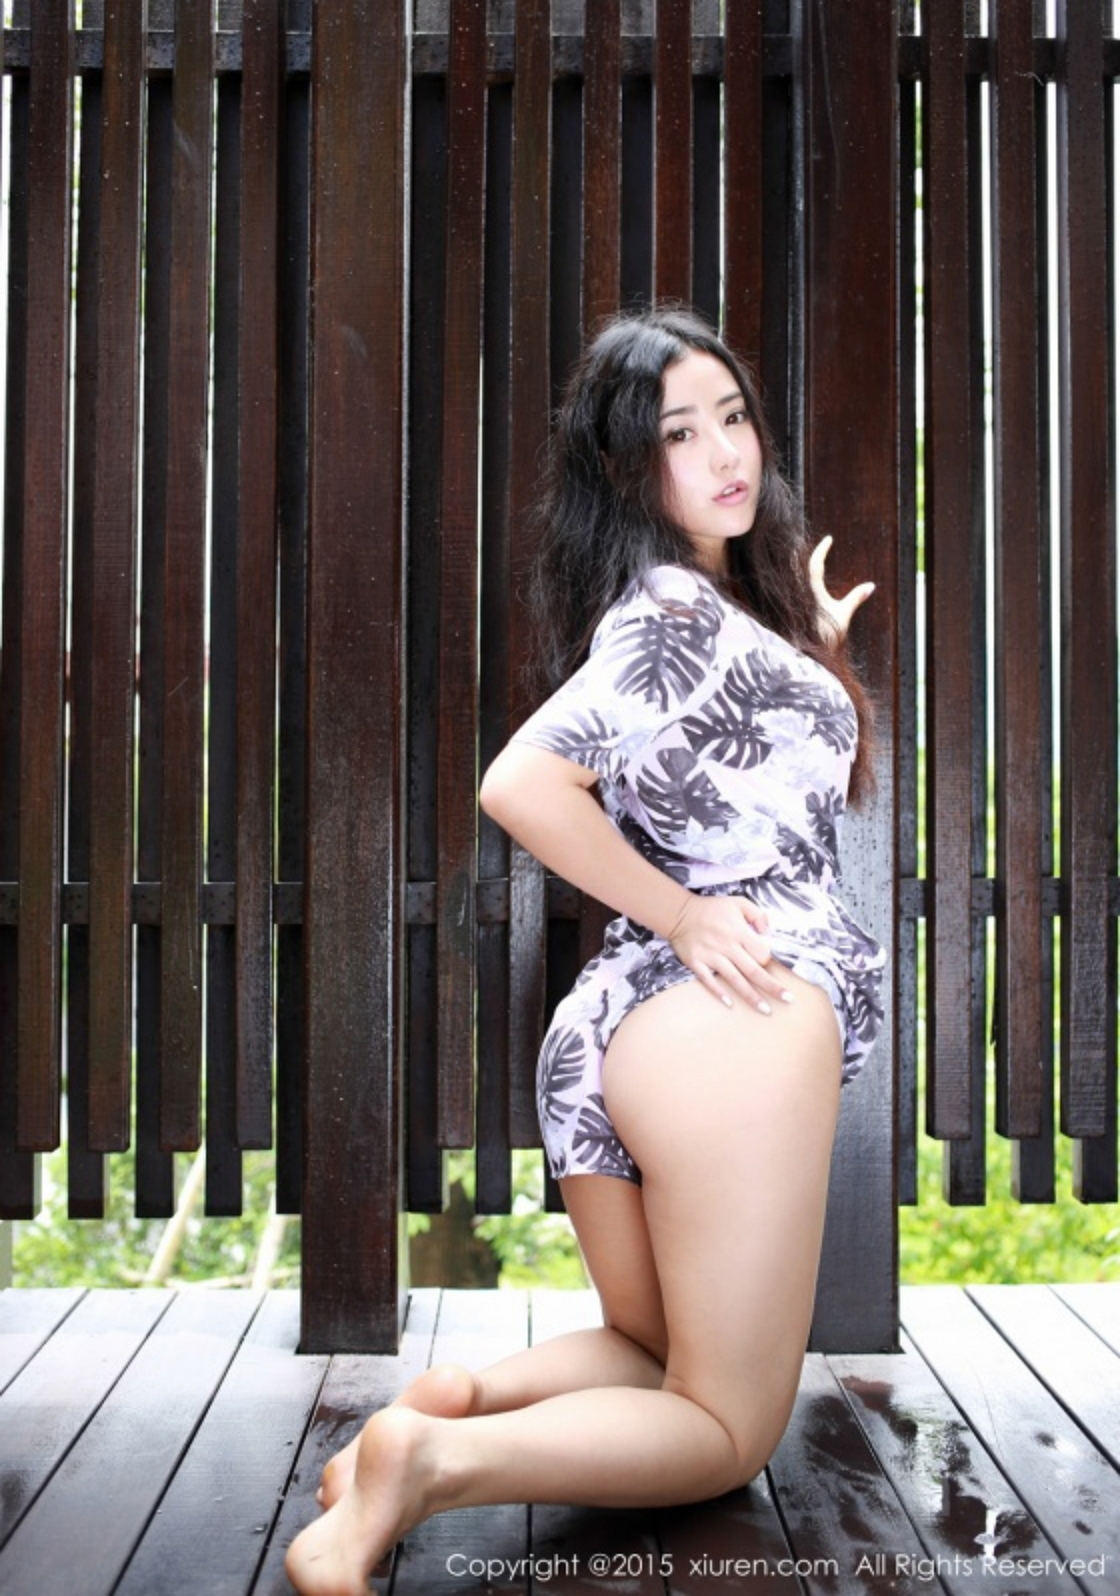 329 056 - Hot Photo XIUREN NO.329 Nude Girl